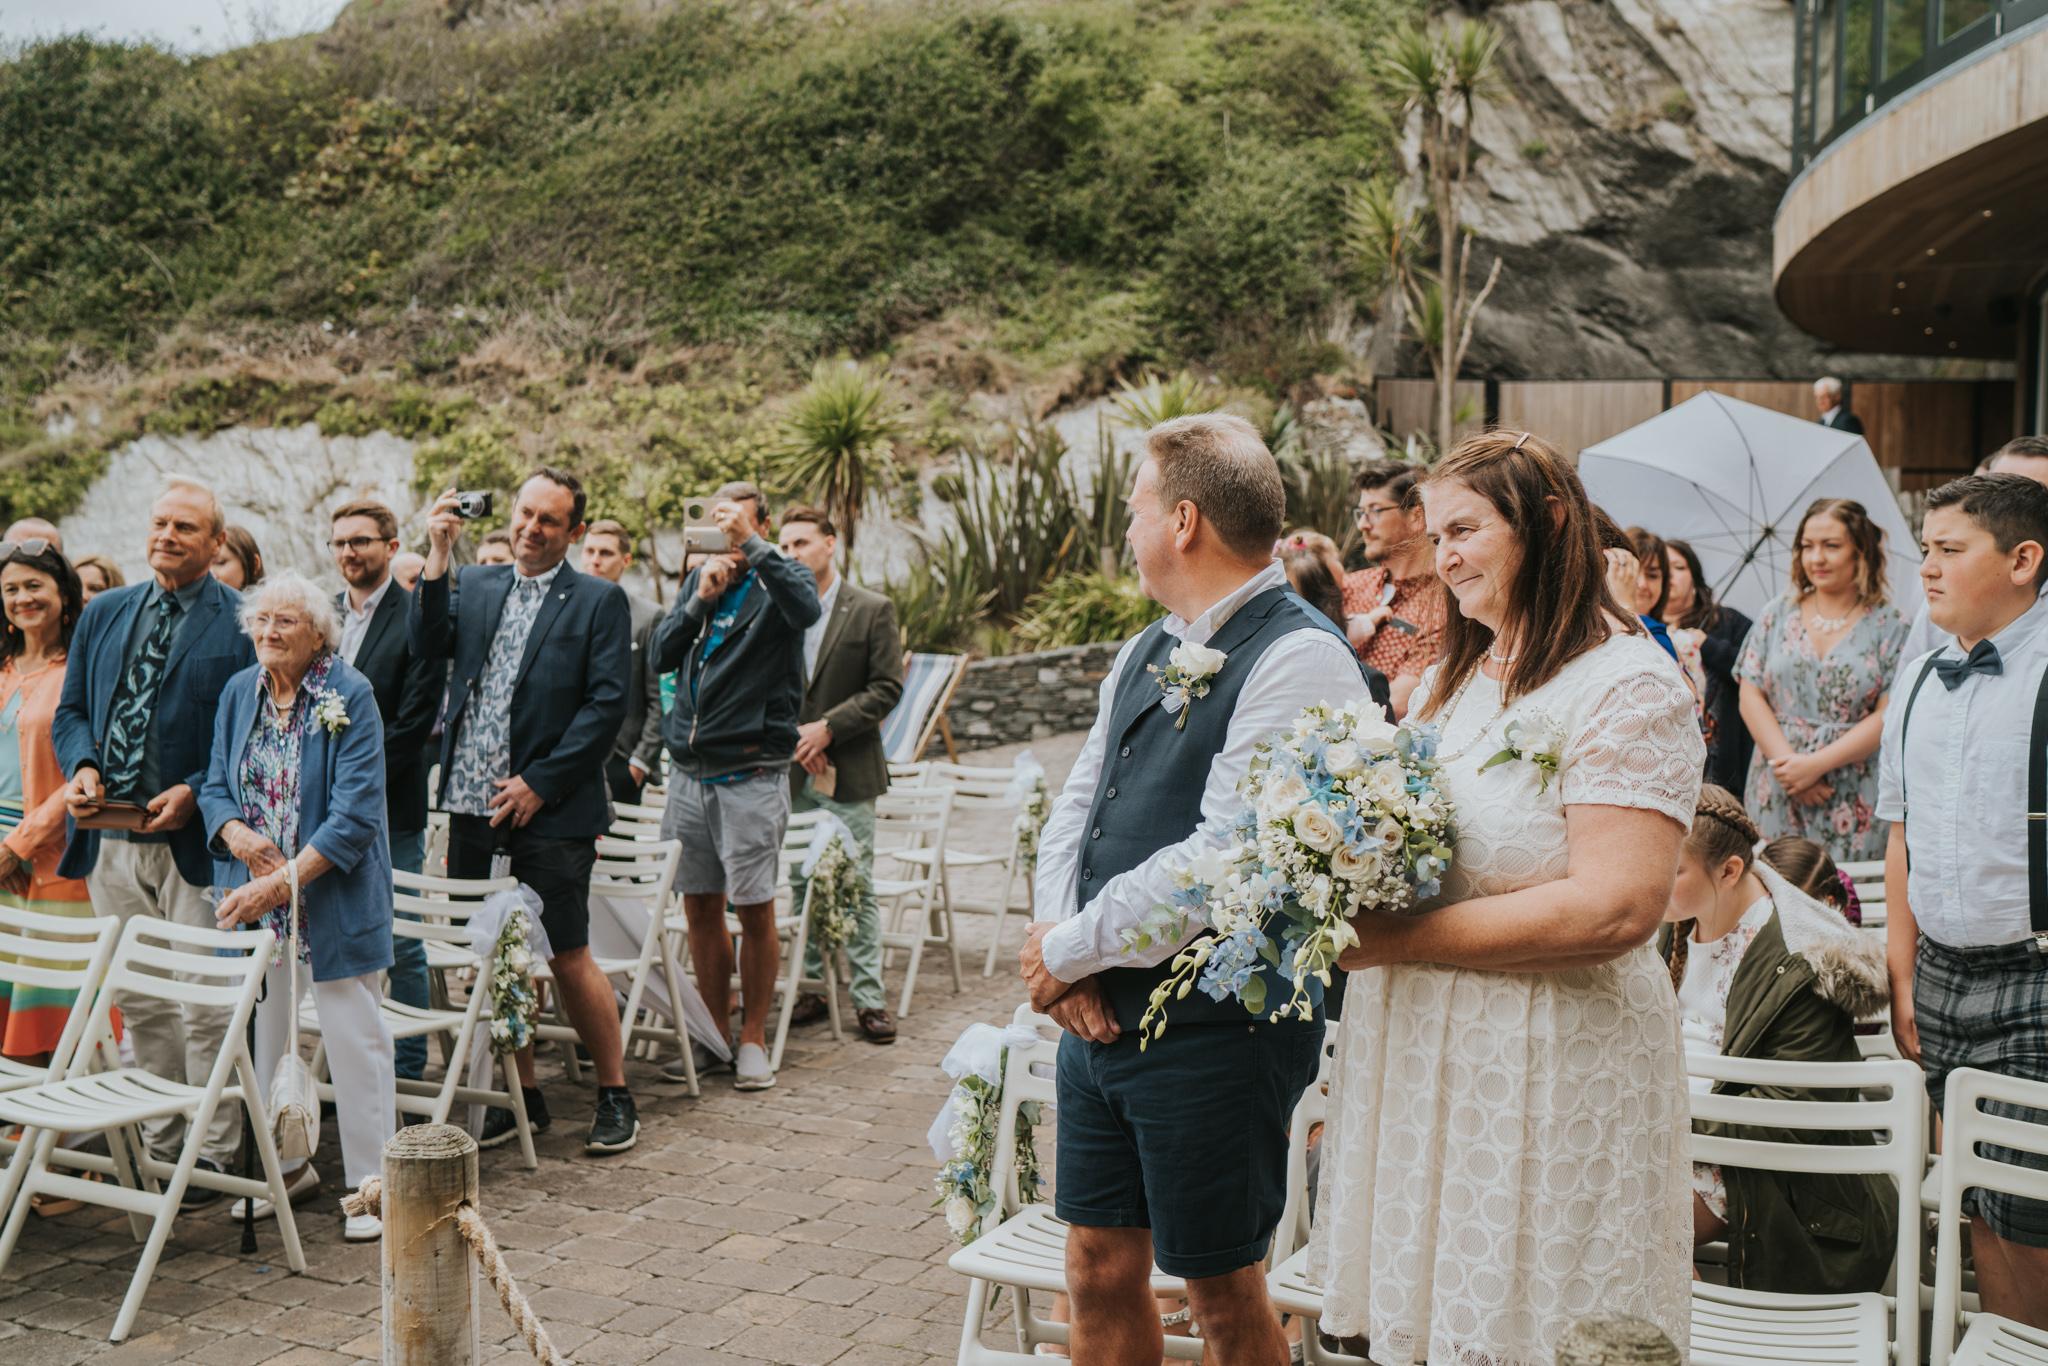 john-amy-relaxed-beach-wedding-tunnels-beaches-ilfracombe-north-devon-grace-elizabeth-colchester-essex-alternative-relaxed-wedding-photography-devon-suffolk-norfolk-essex (63 of 159).jpg